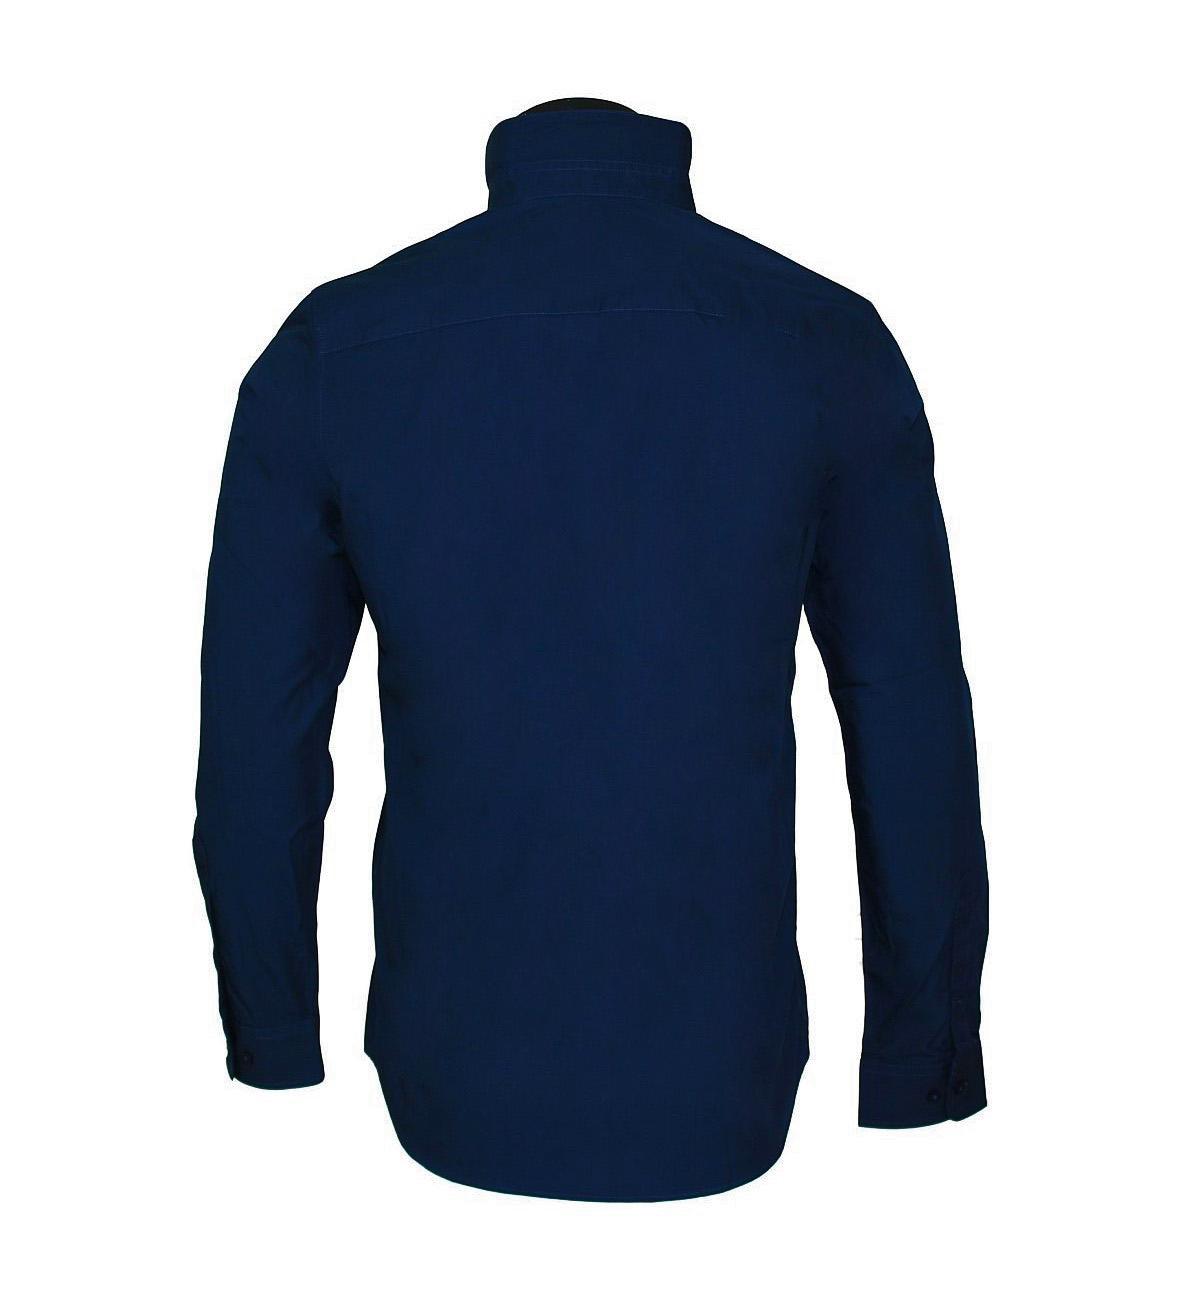 Tom Tailor Hemd Herrenhemd Floyd stretch shirt 2031470 9910 navy